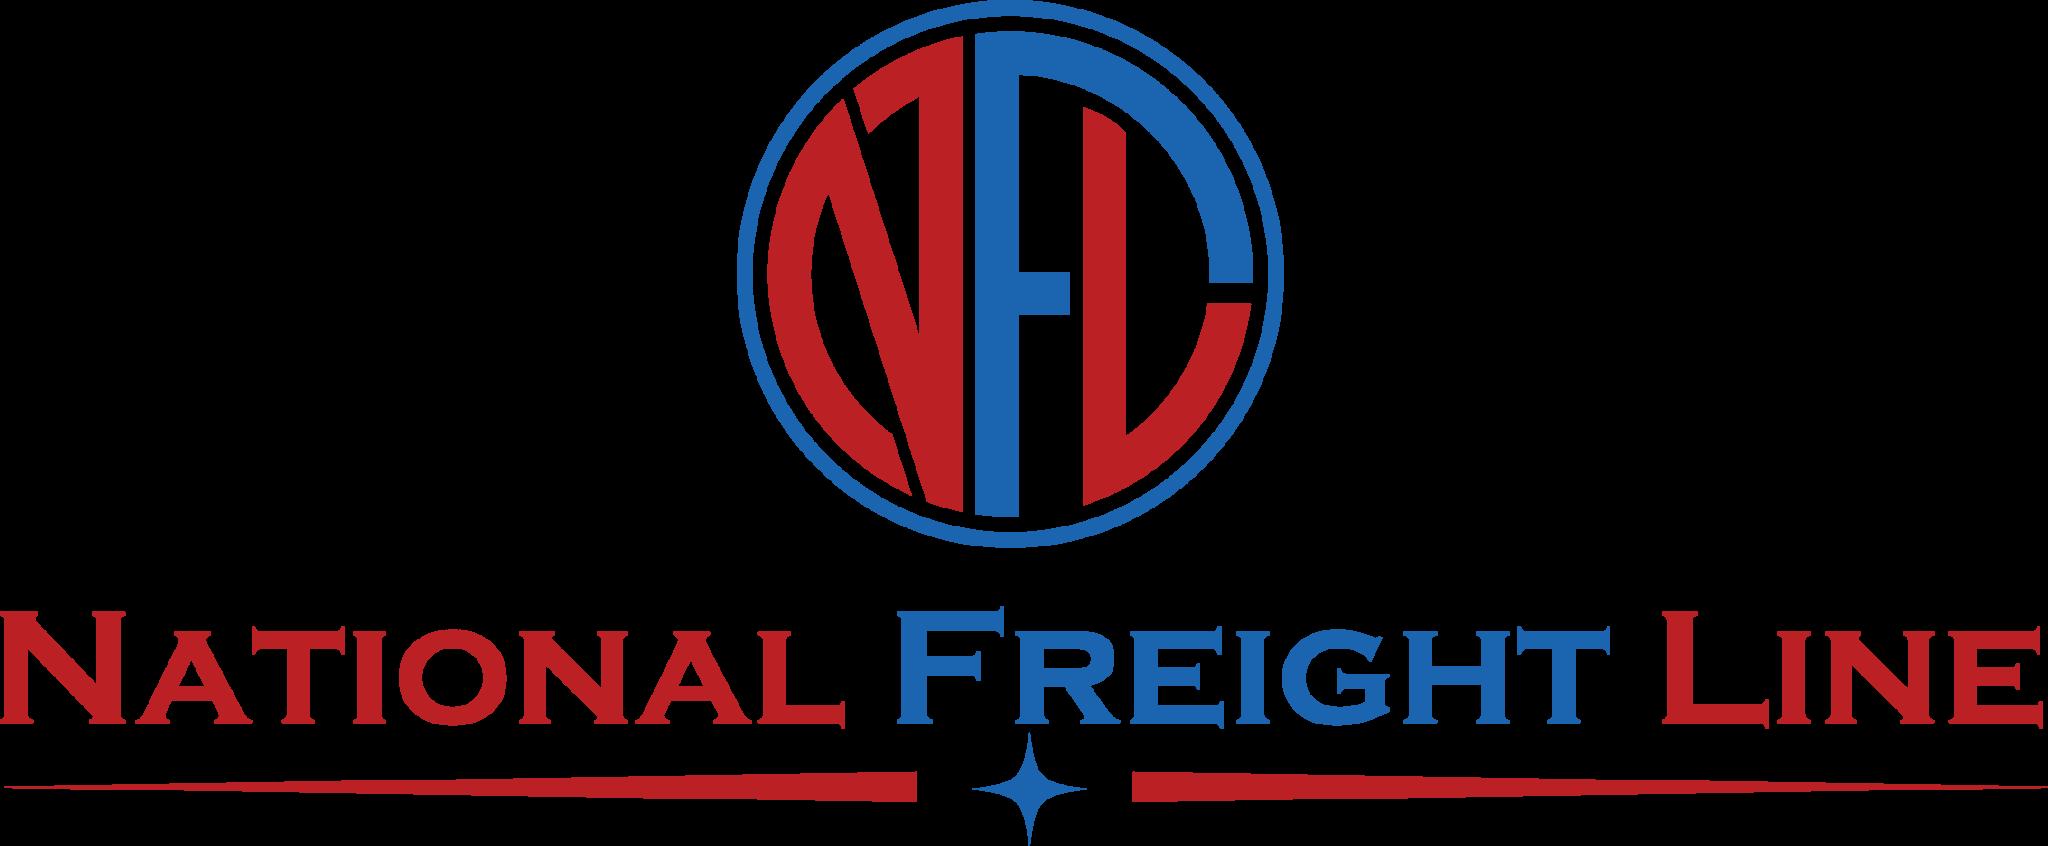 NFL Logistics